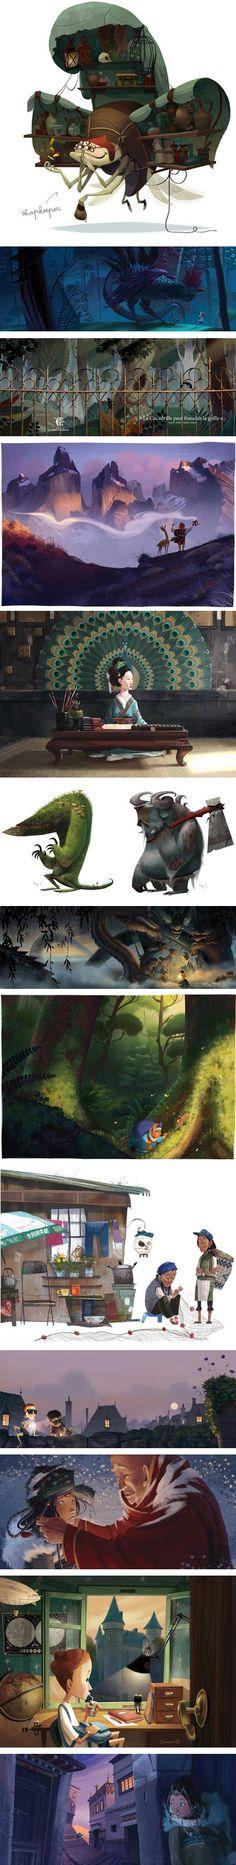 Julia Sarda is an illustrator, concept artist and character designer based in Barcelona.